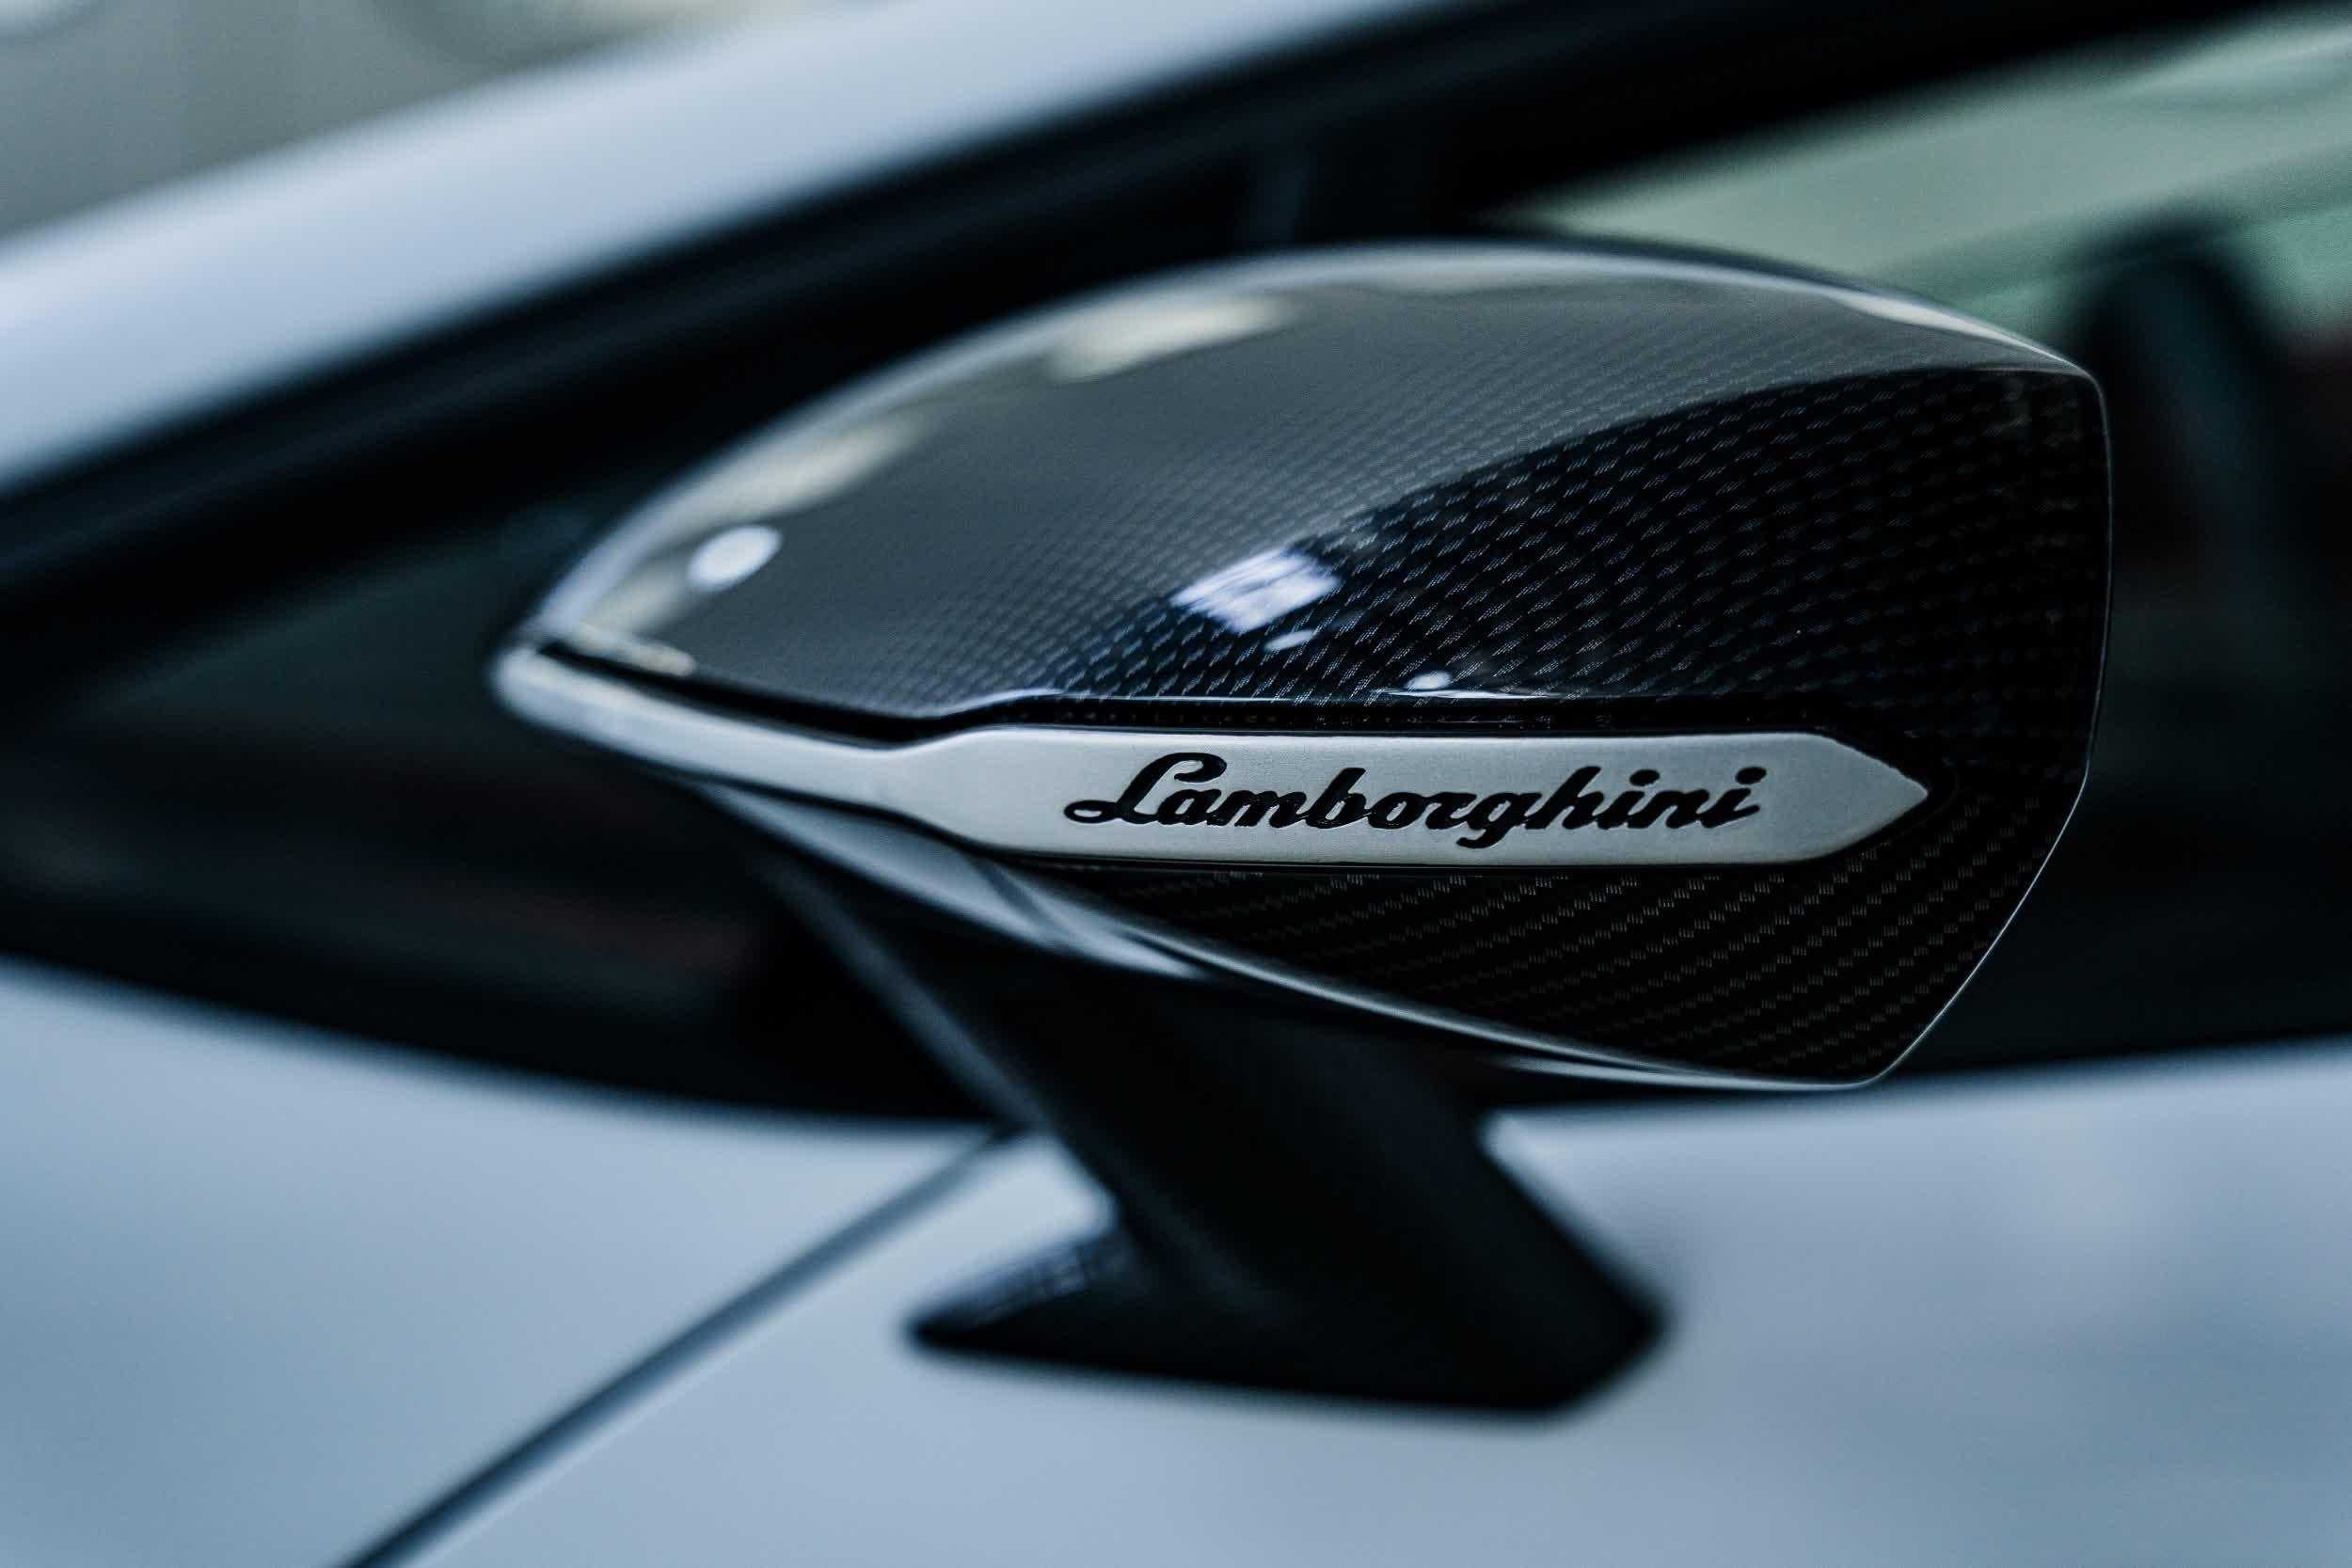 1628885888 534 Lamborghini ramene la Countach en tant quhybride en edition limitee